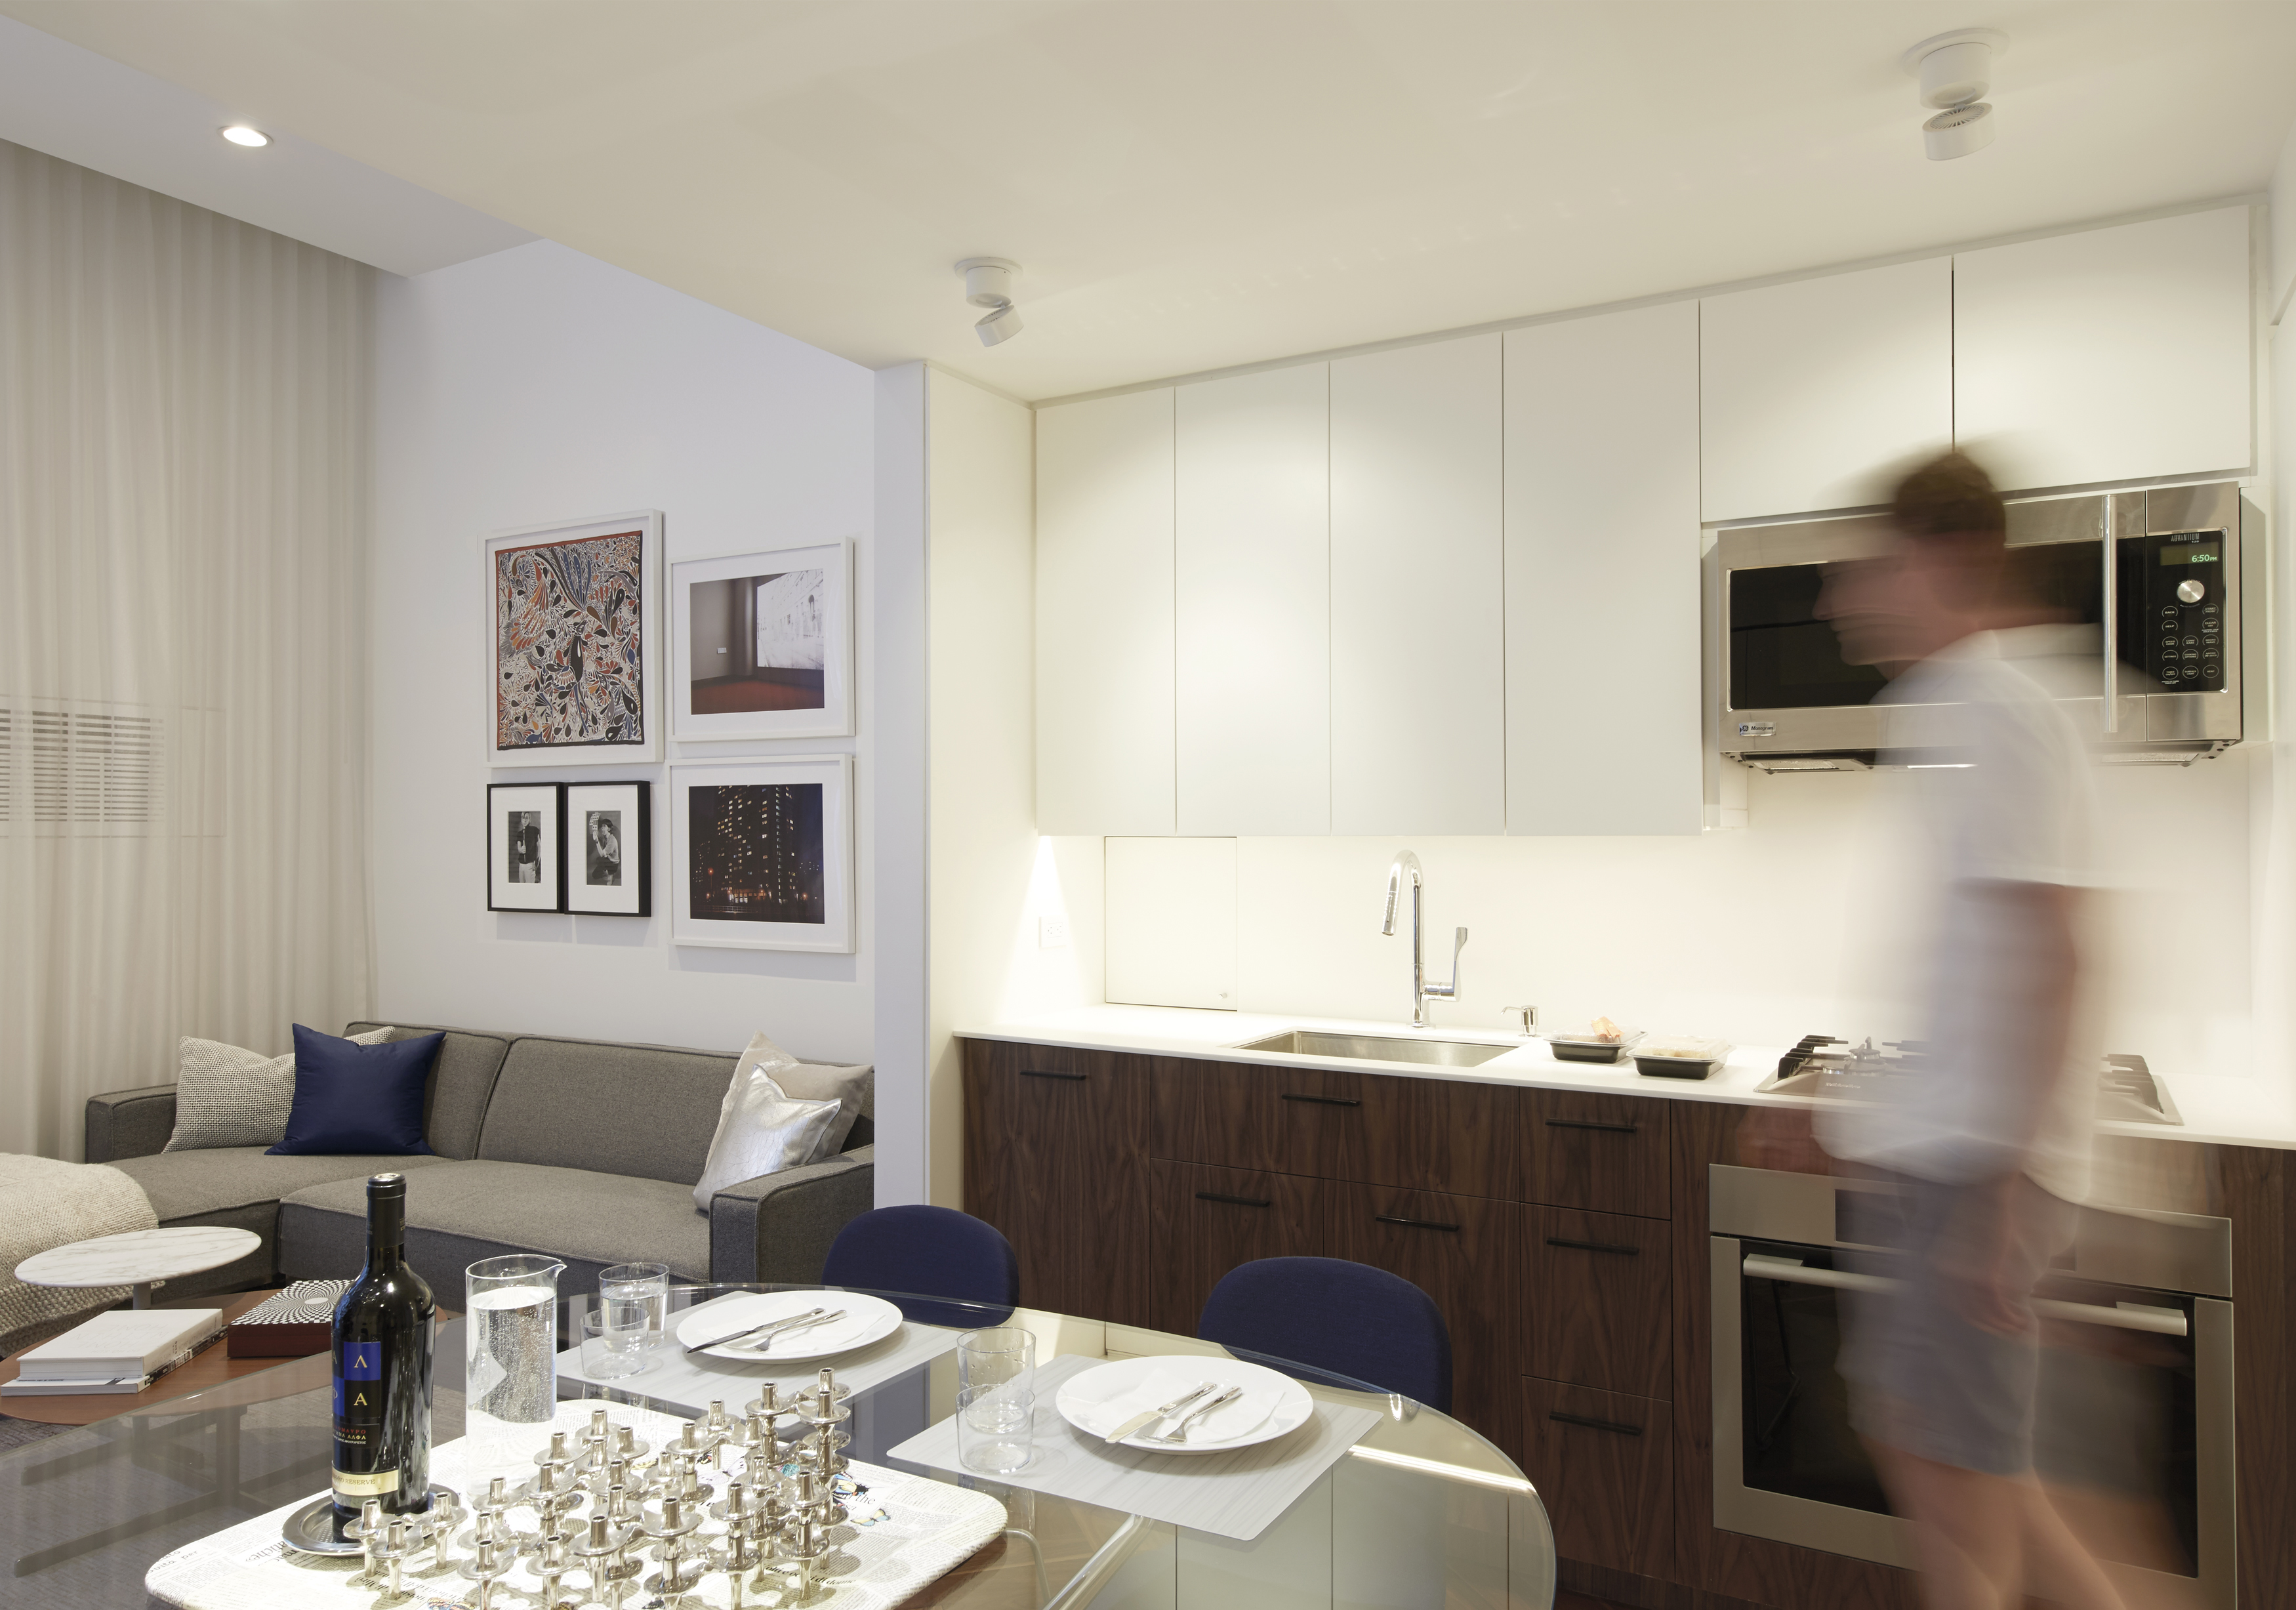 86 interior designer trade discount emerson resort for Hudson valley interior design